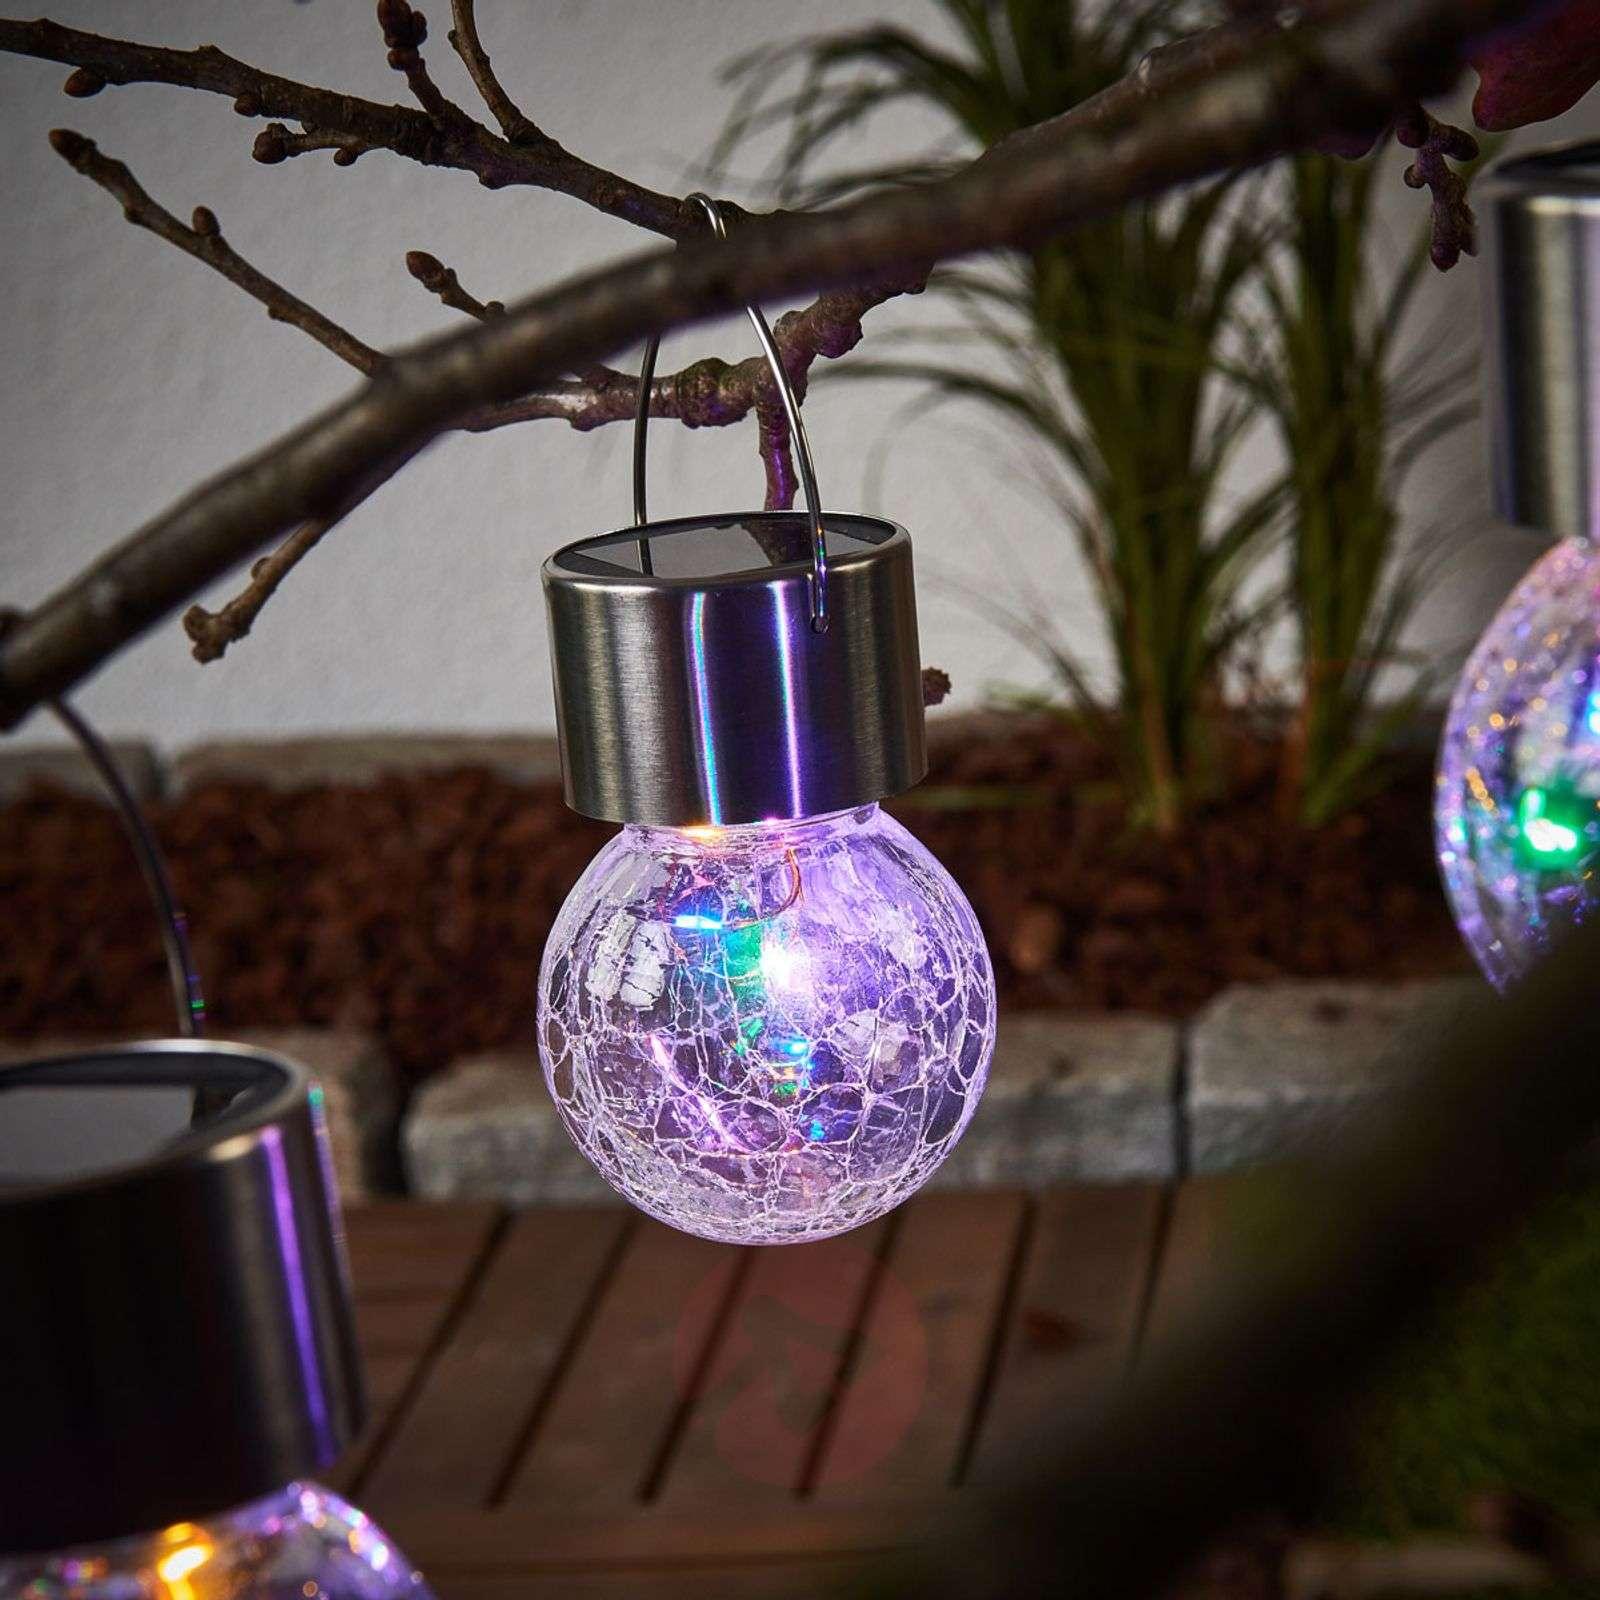 LED solar hanging lamp Colour Ball, set of 3-3012234-01